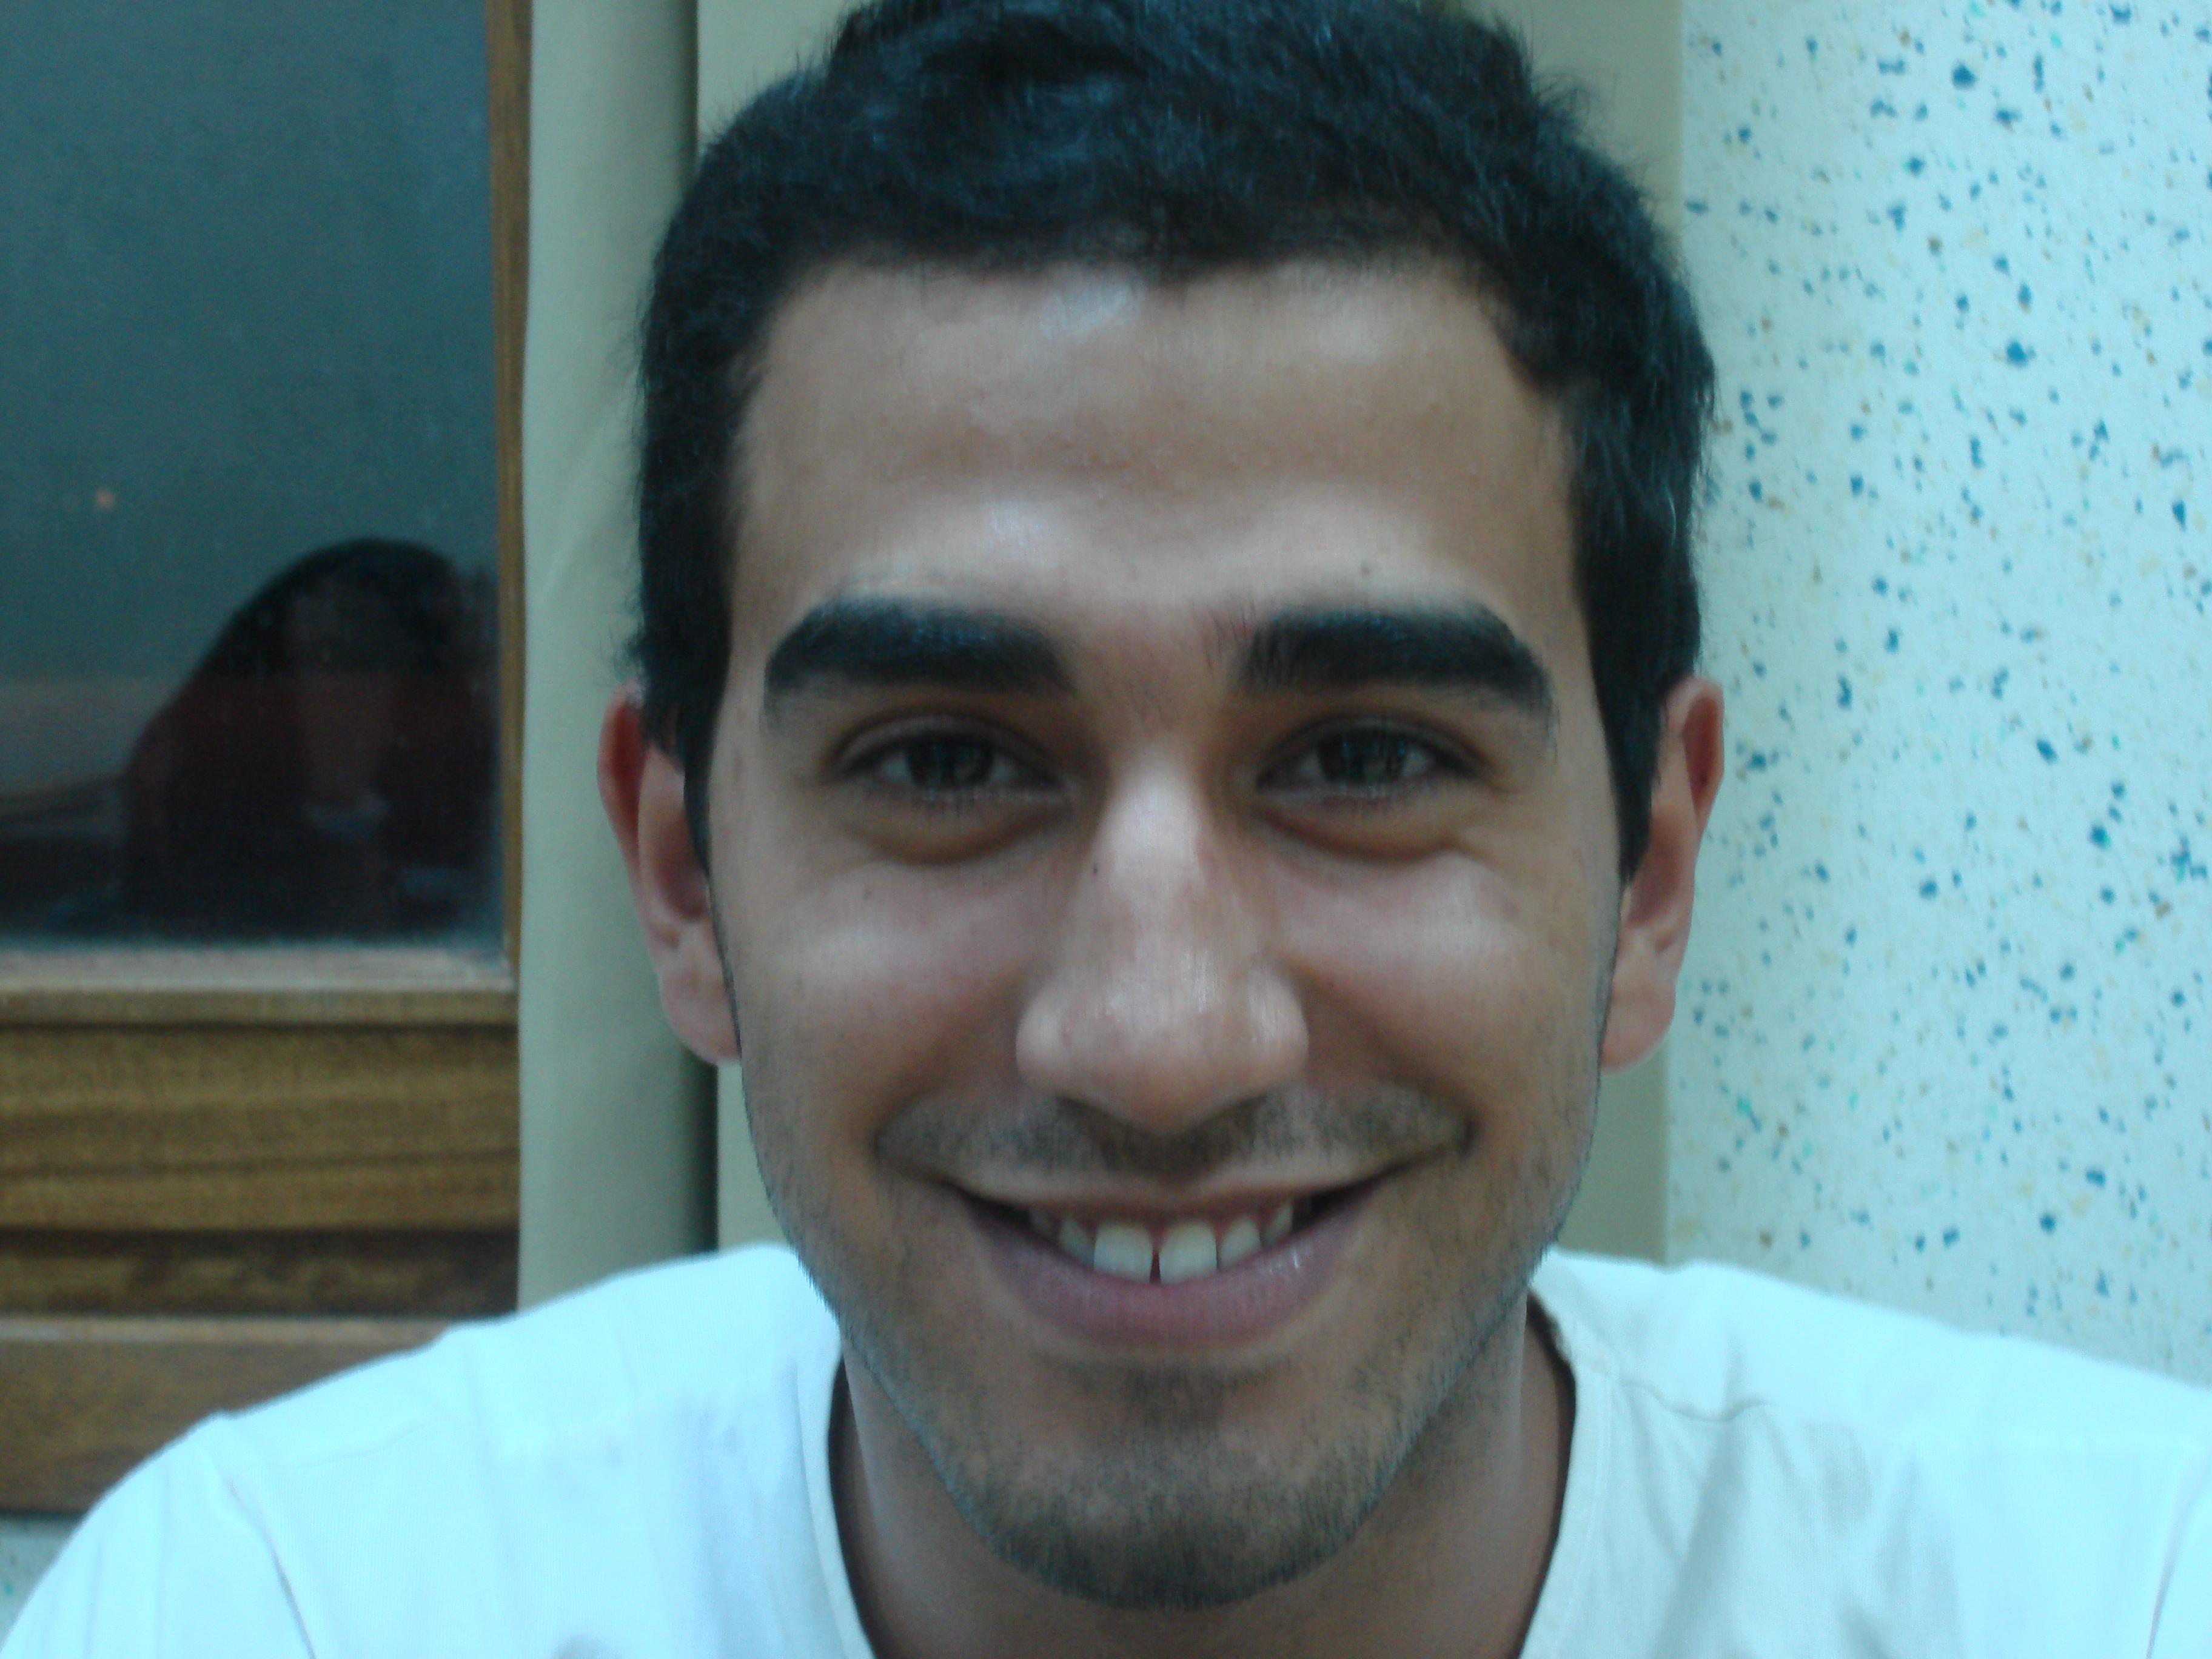 Labib, Mohammed Yassine